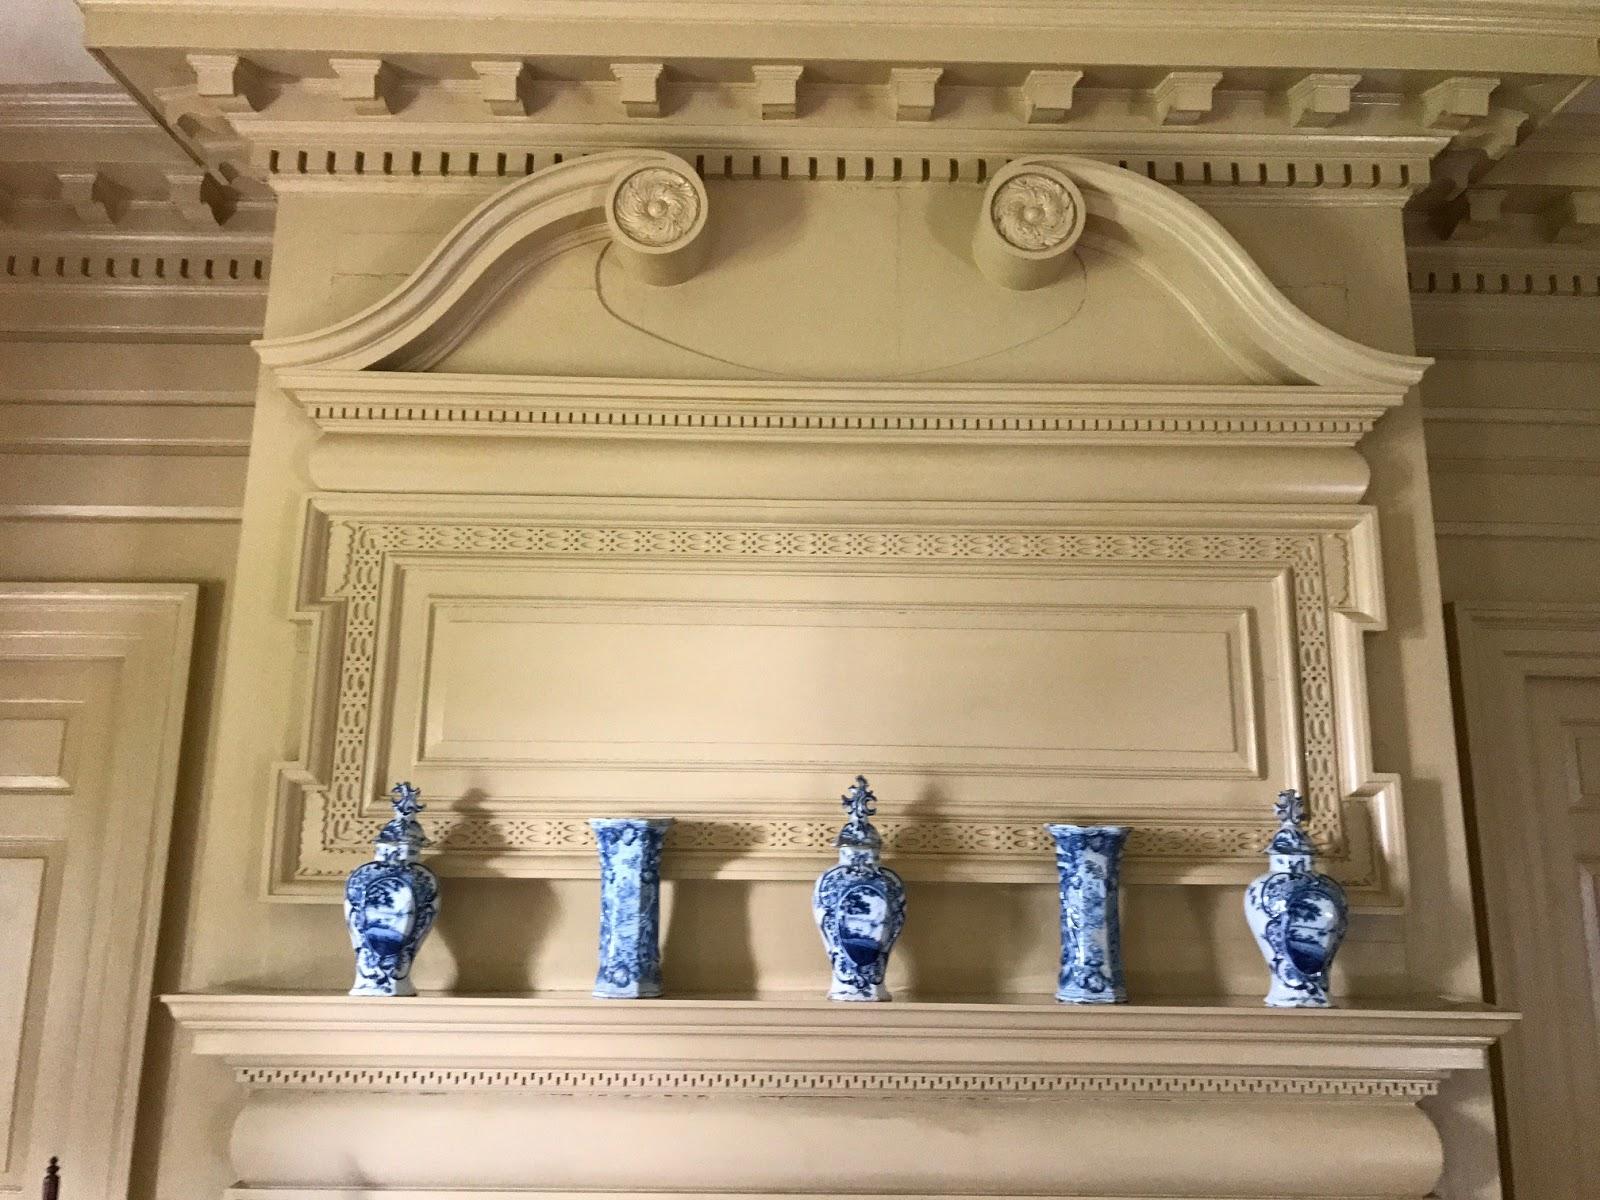 Schuyler Mansion State Historic Site: Paint in the Schuyler Mansion ...